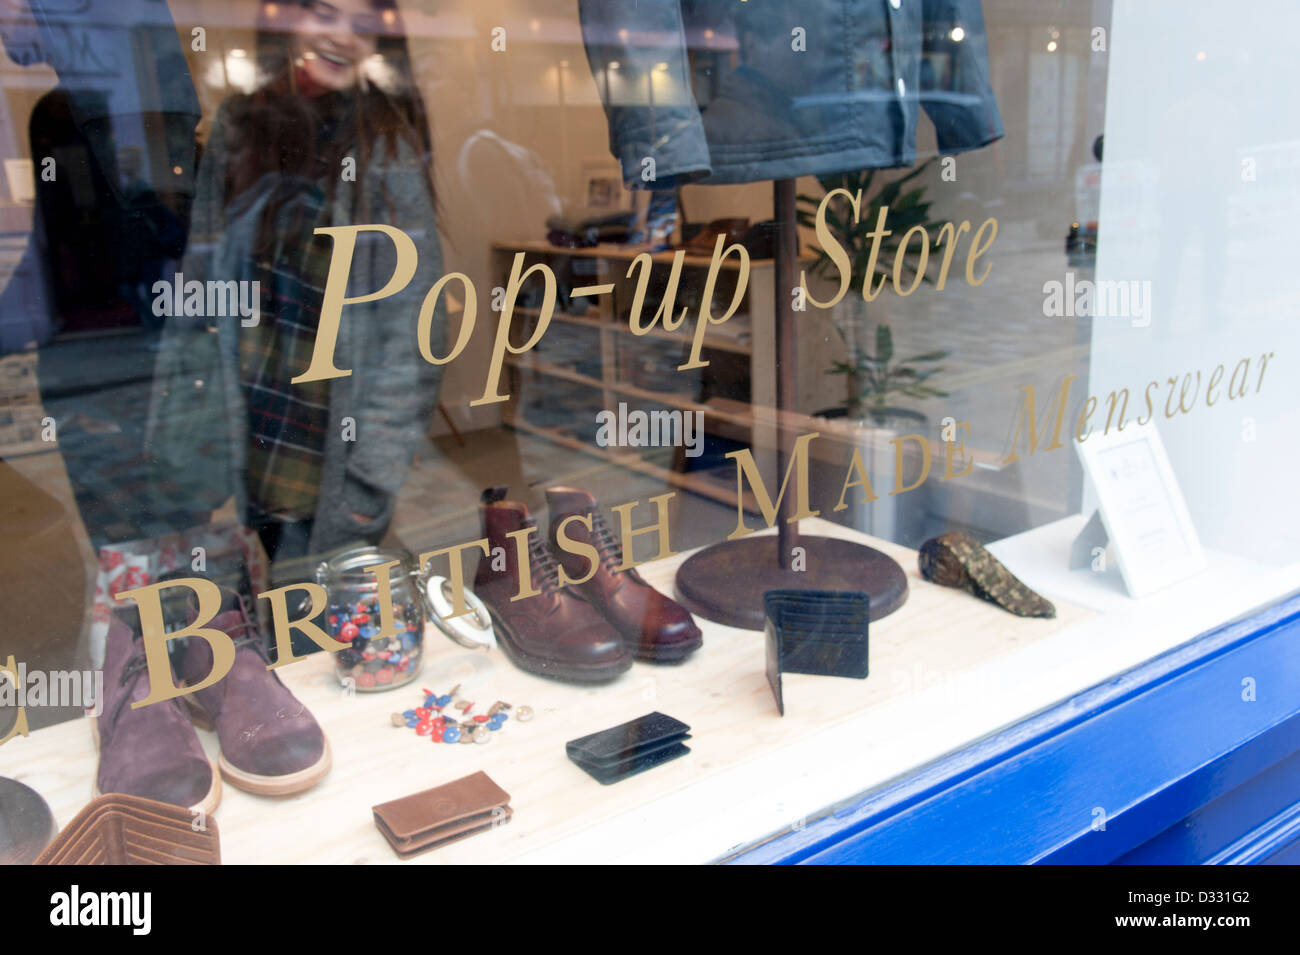 Pop-up store escaparate, Londres, Inglaterra, Reino Unido. Imagen De Stock